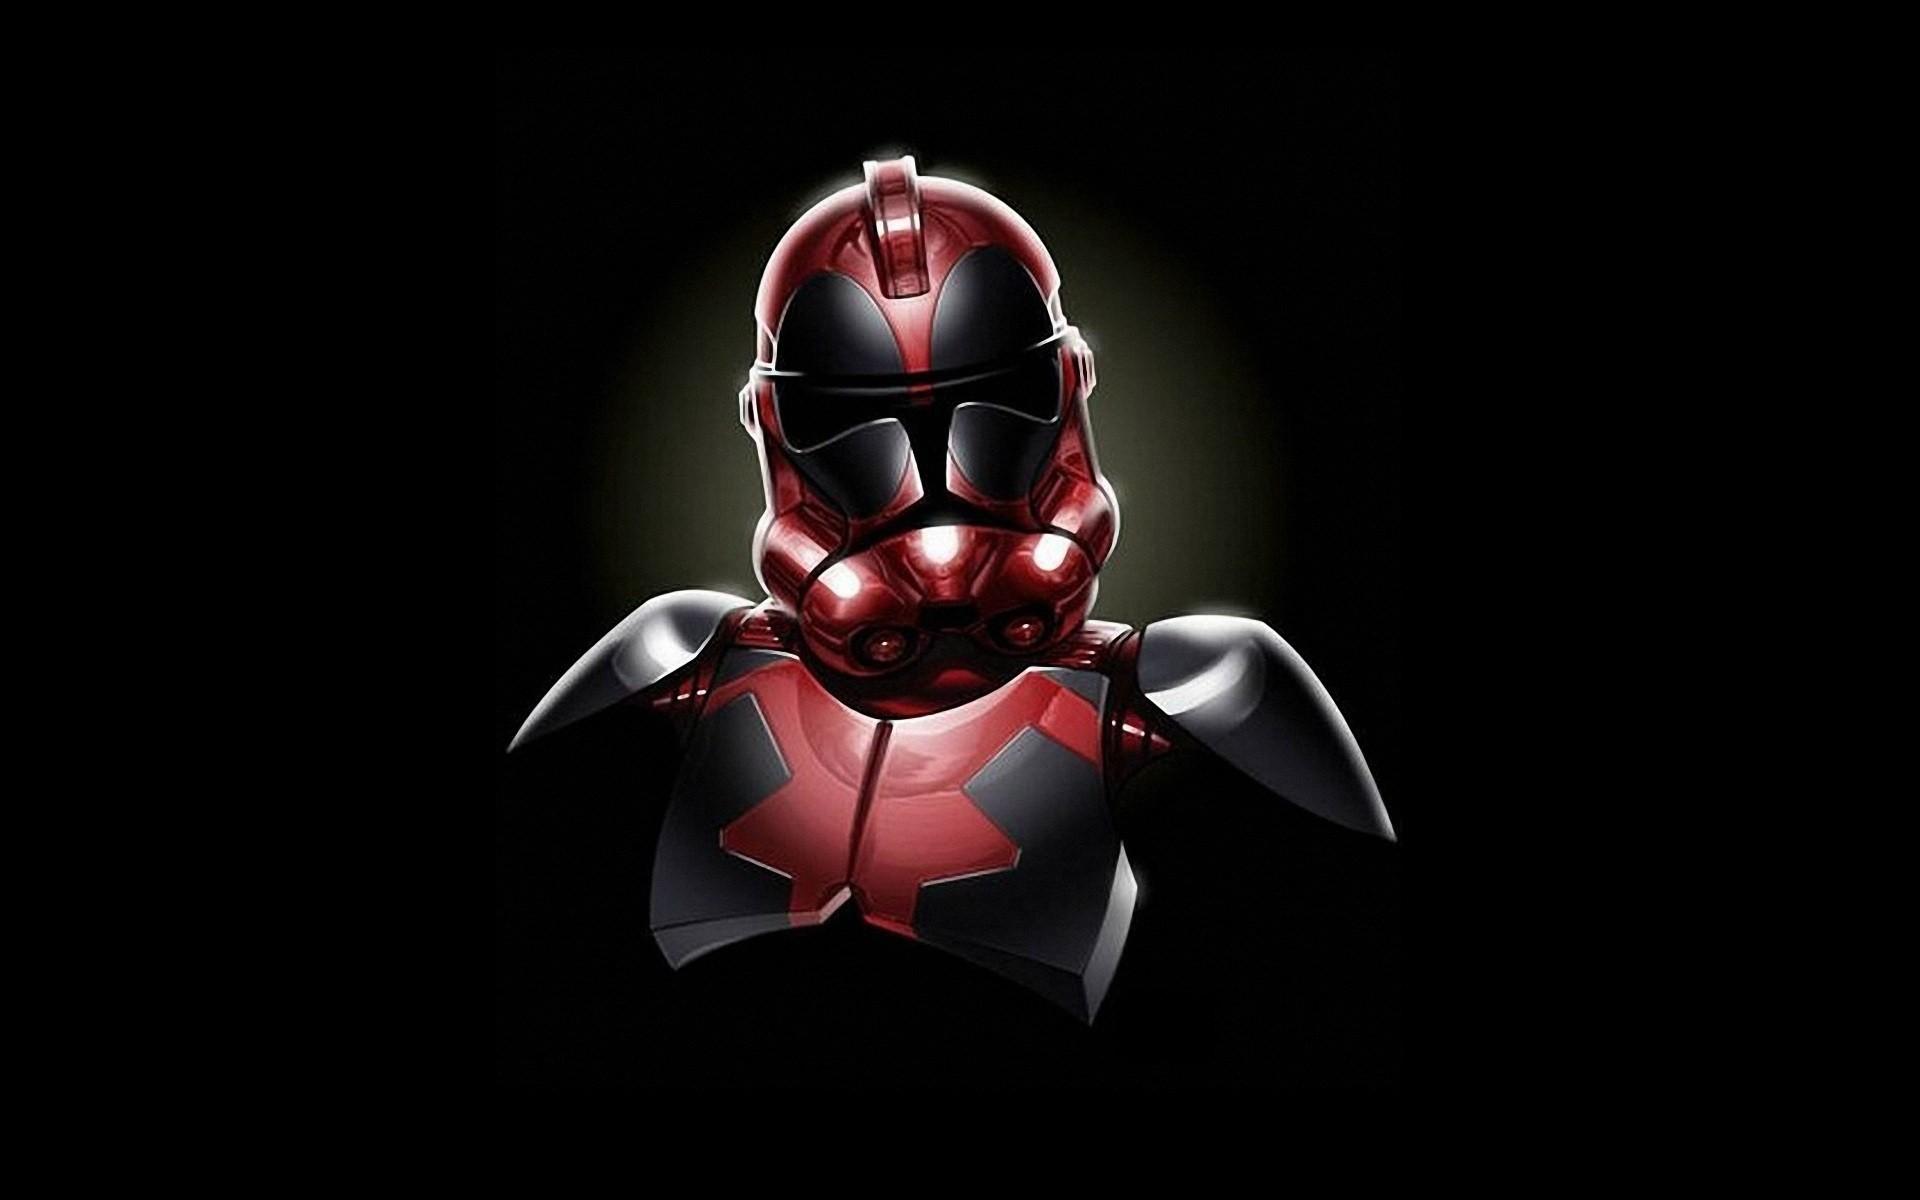 … Cool Star Wars Clone Troopers Wallpaper Free download best Latest 3D HD  desktop wallpapers background Wide